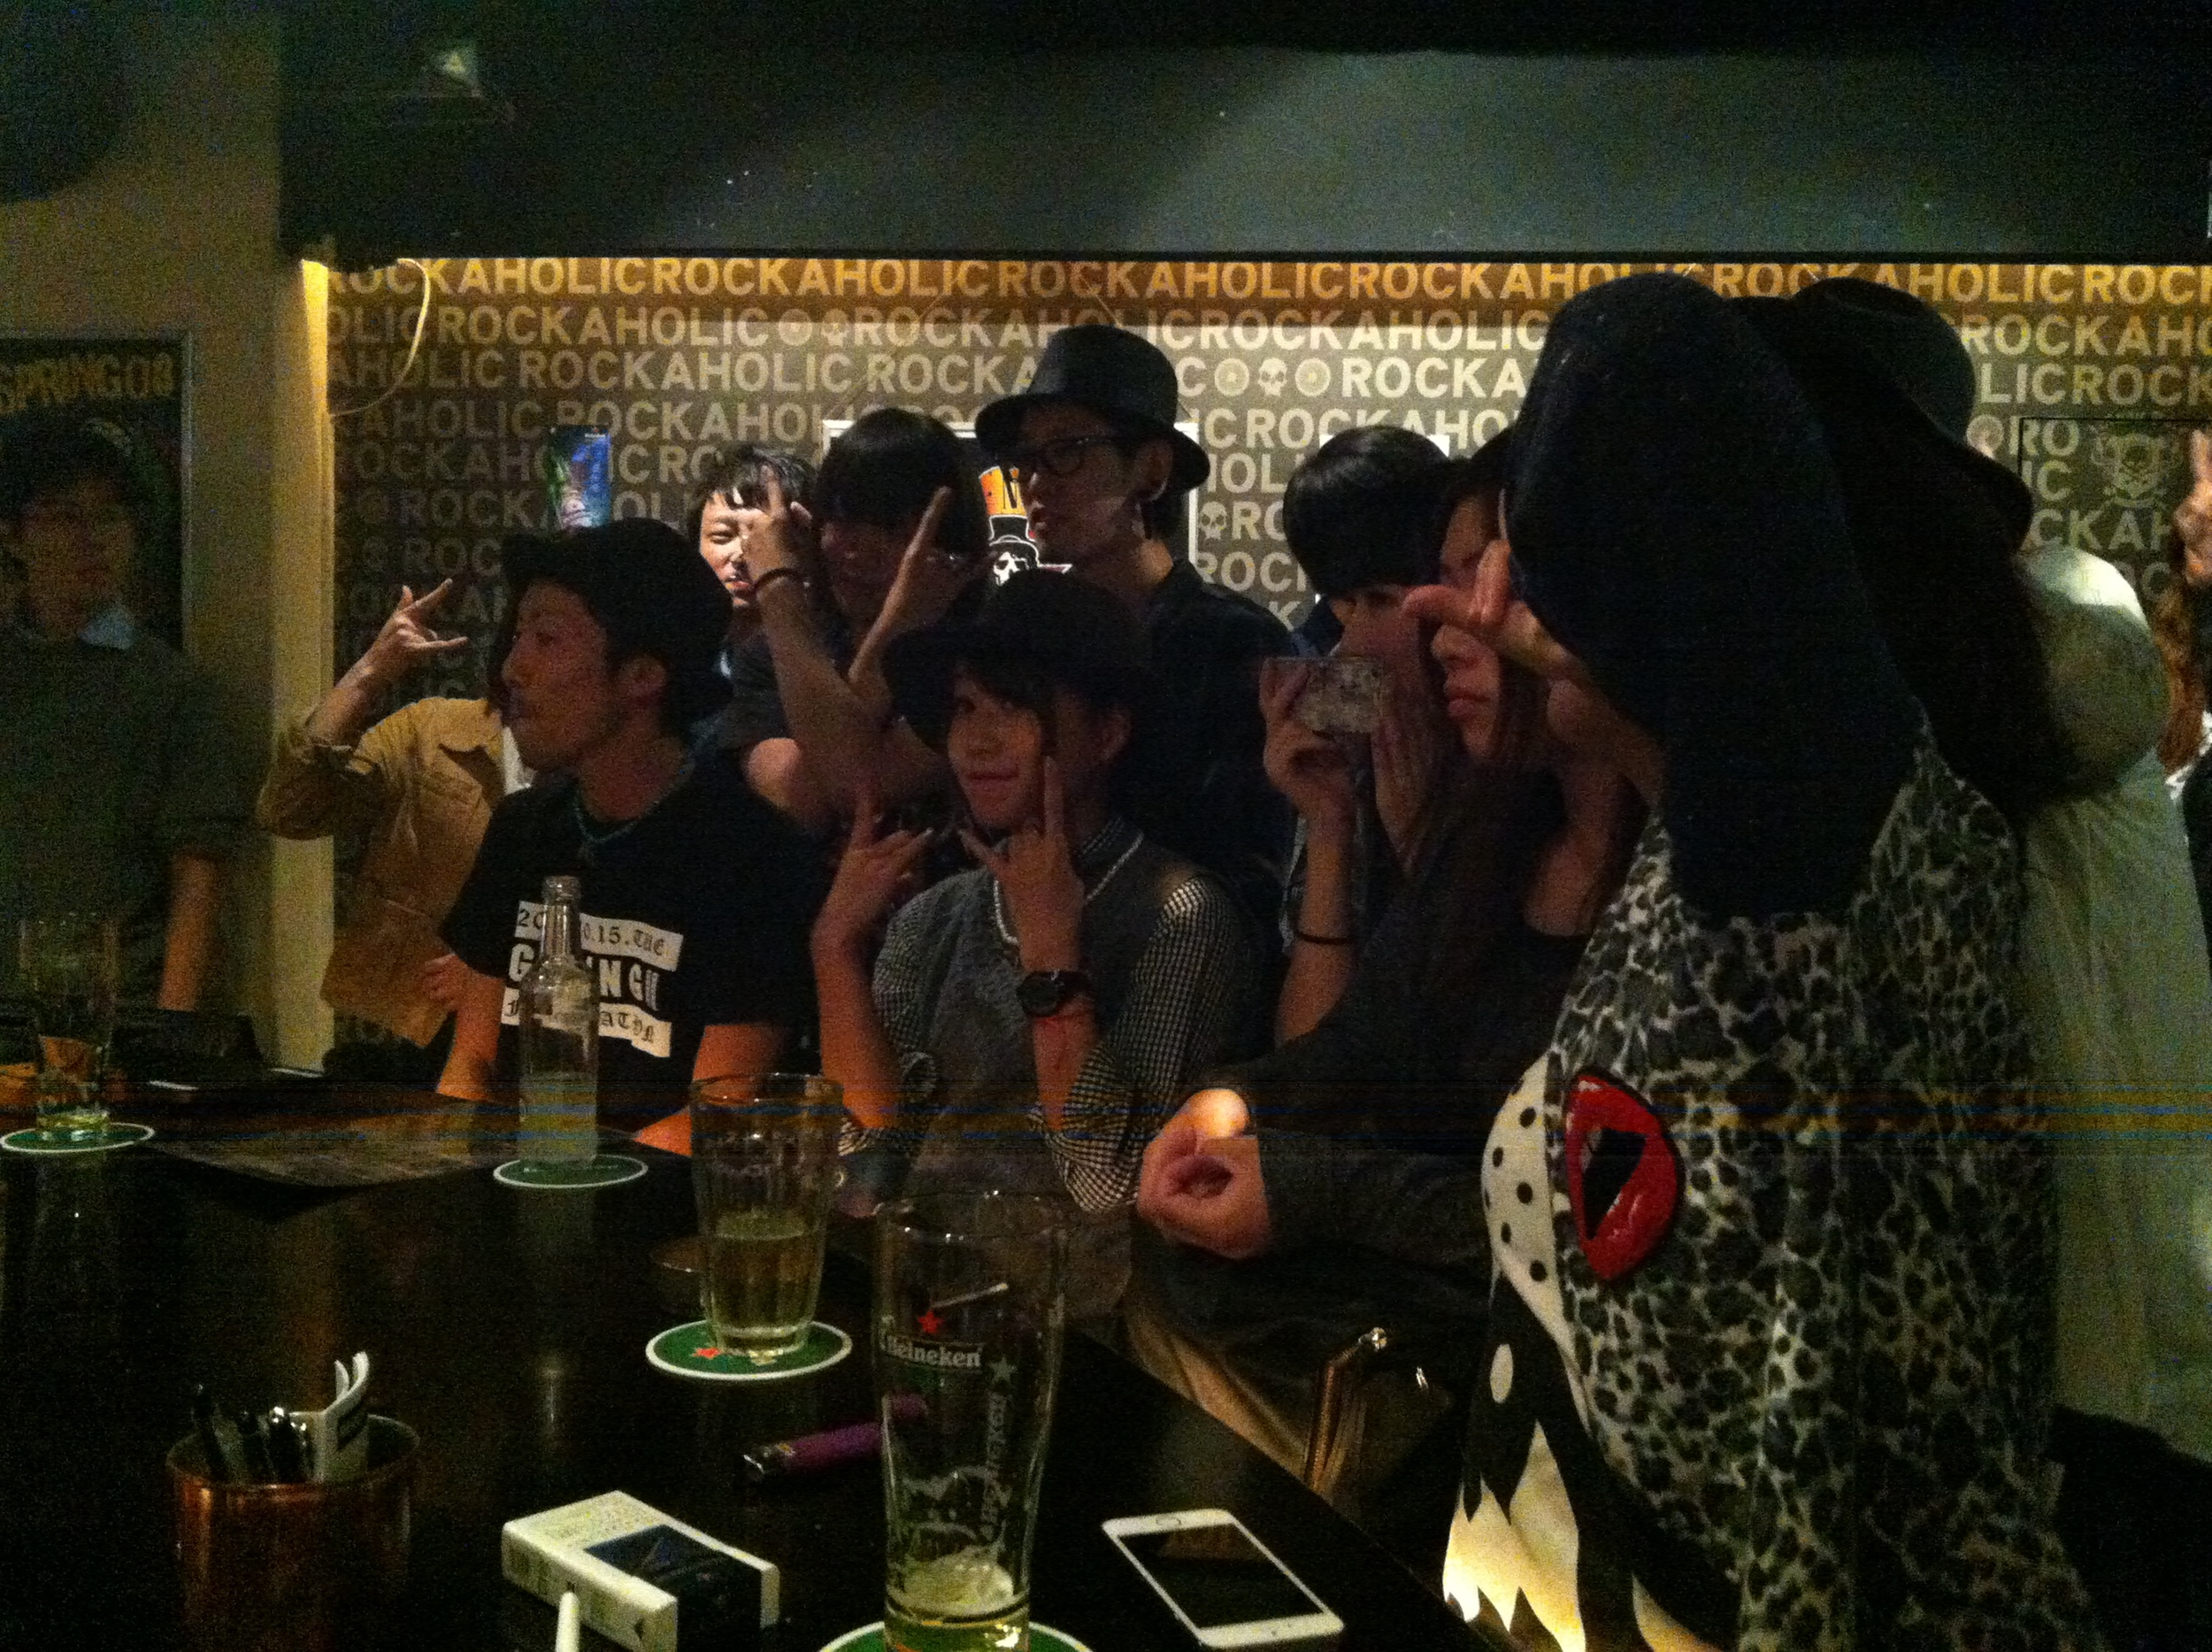 Shibuya punk rock bar culture